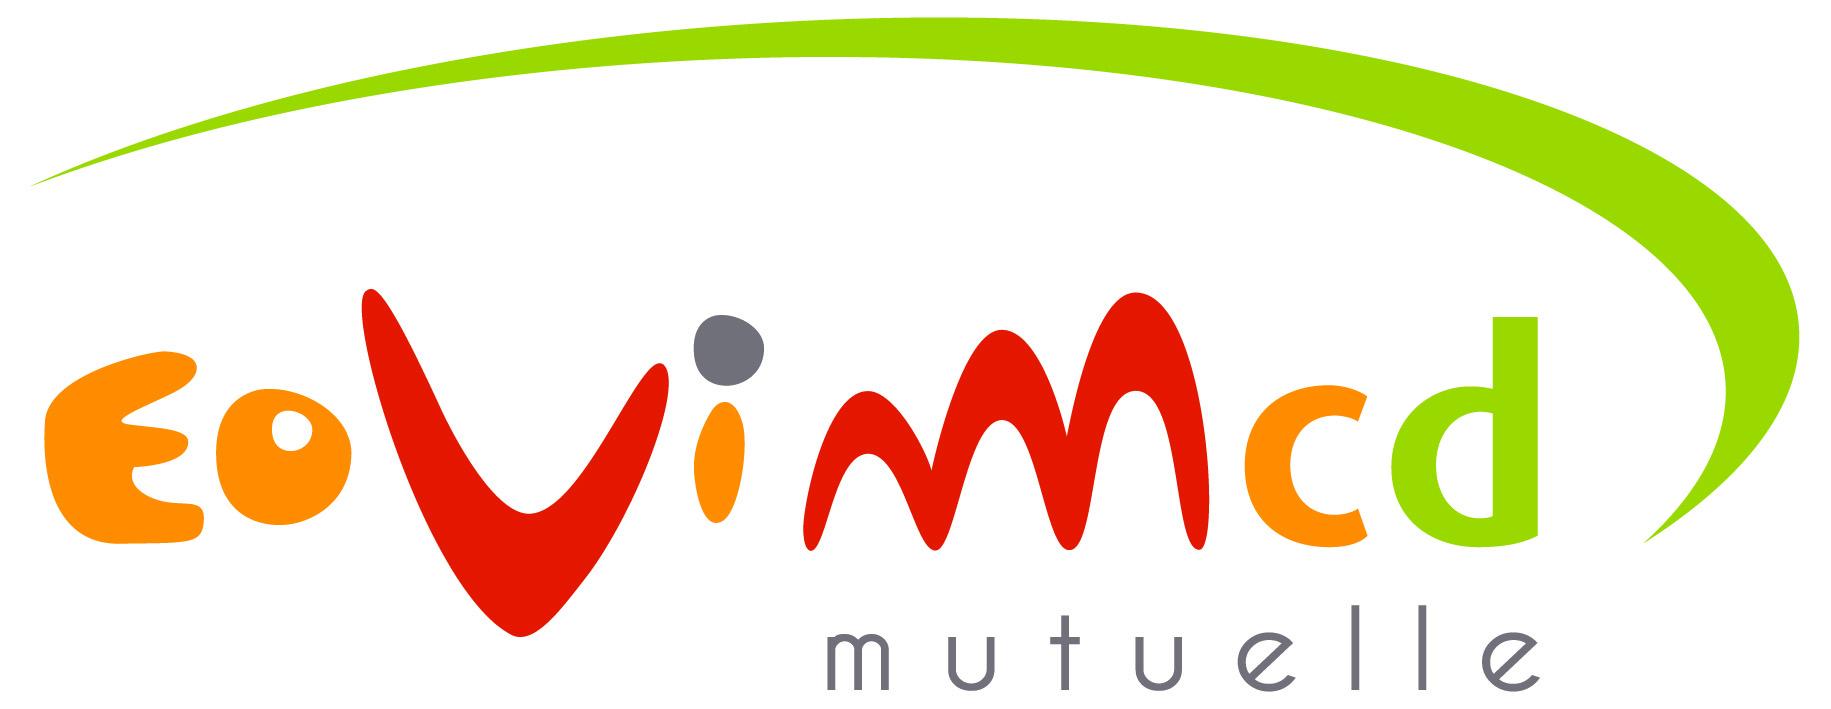 EOVI MCD logo Mutuelle